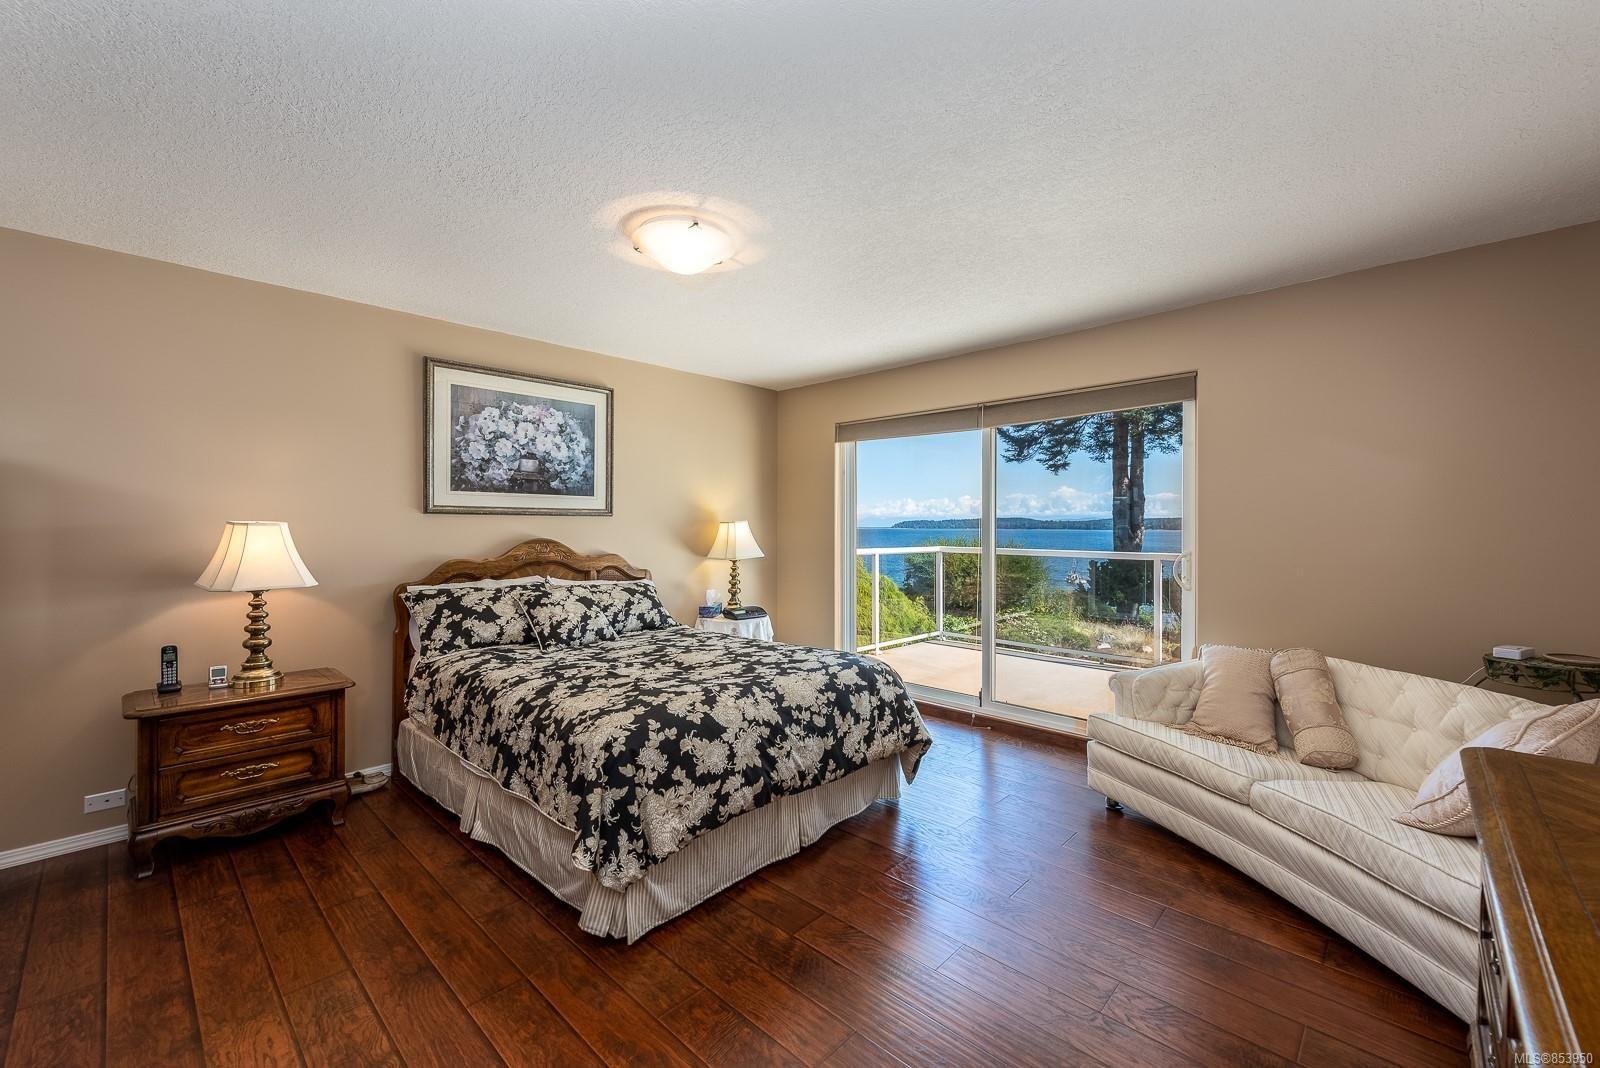 Photo 24: Photos: 5880 GARVIN Rd in : CV Union Bay/Fanny Bay House for sale (Comox Valley)  : MLS®# 853950